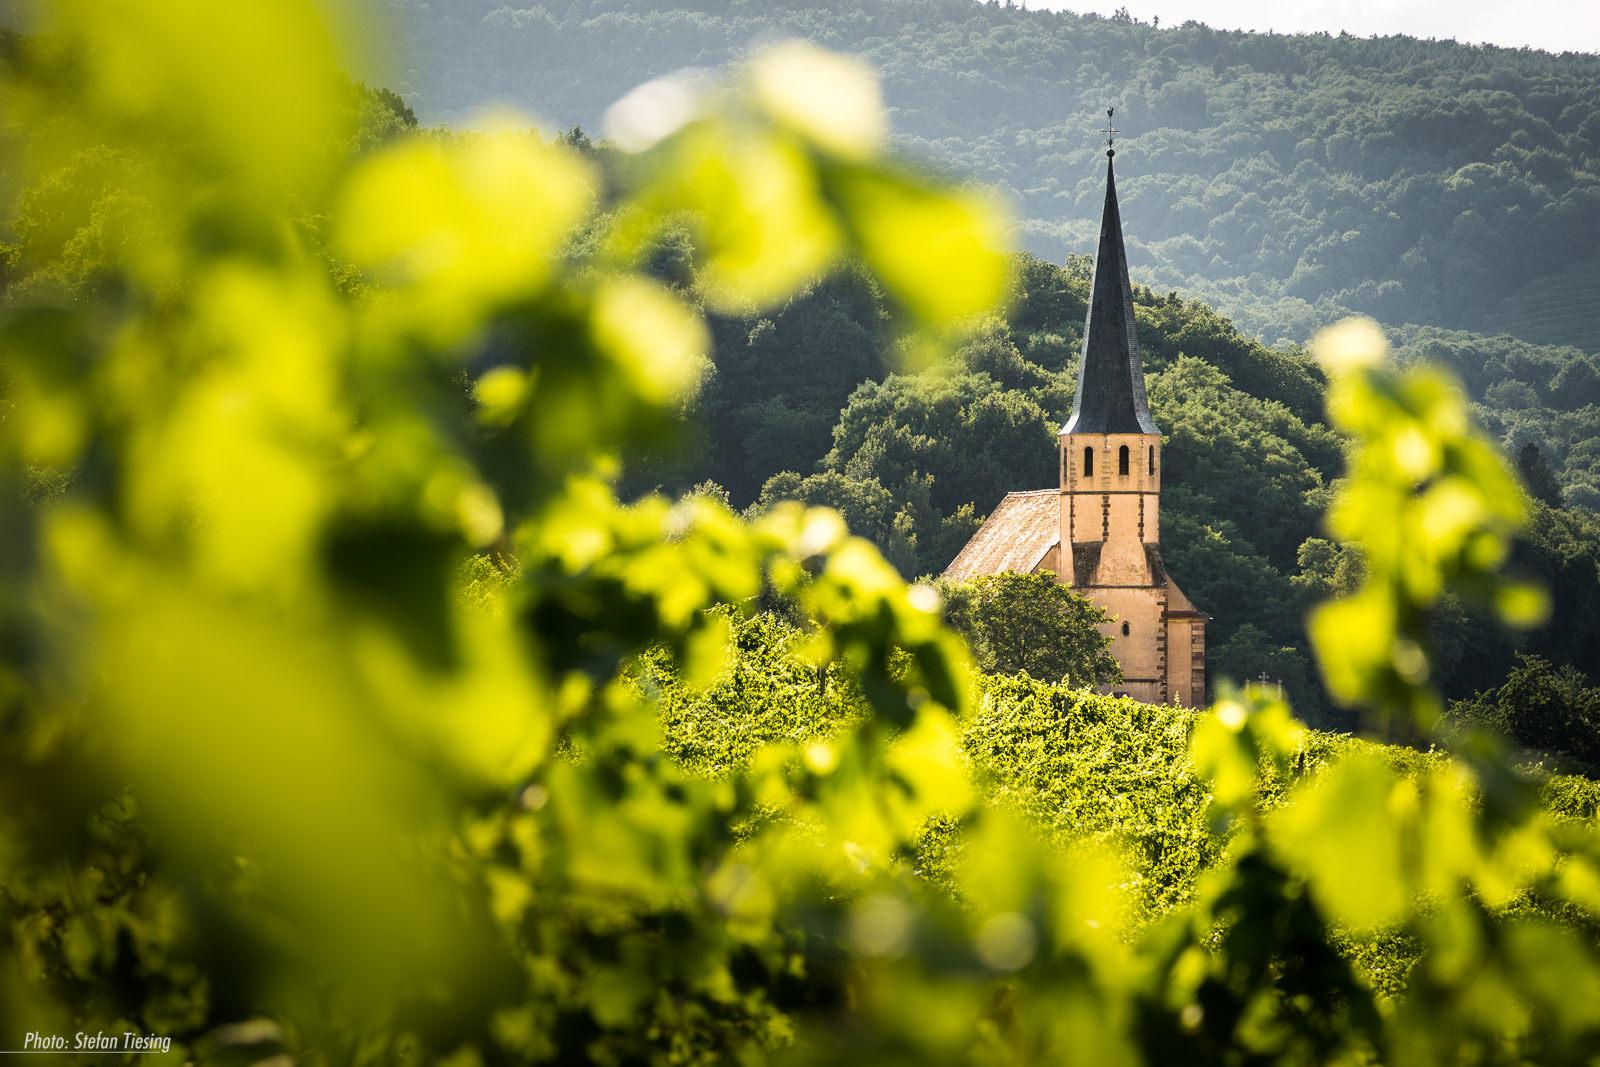 Église Saint-André at Andlau (Alsace)